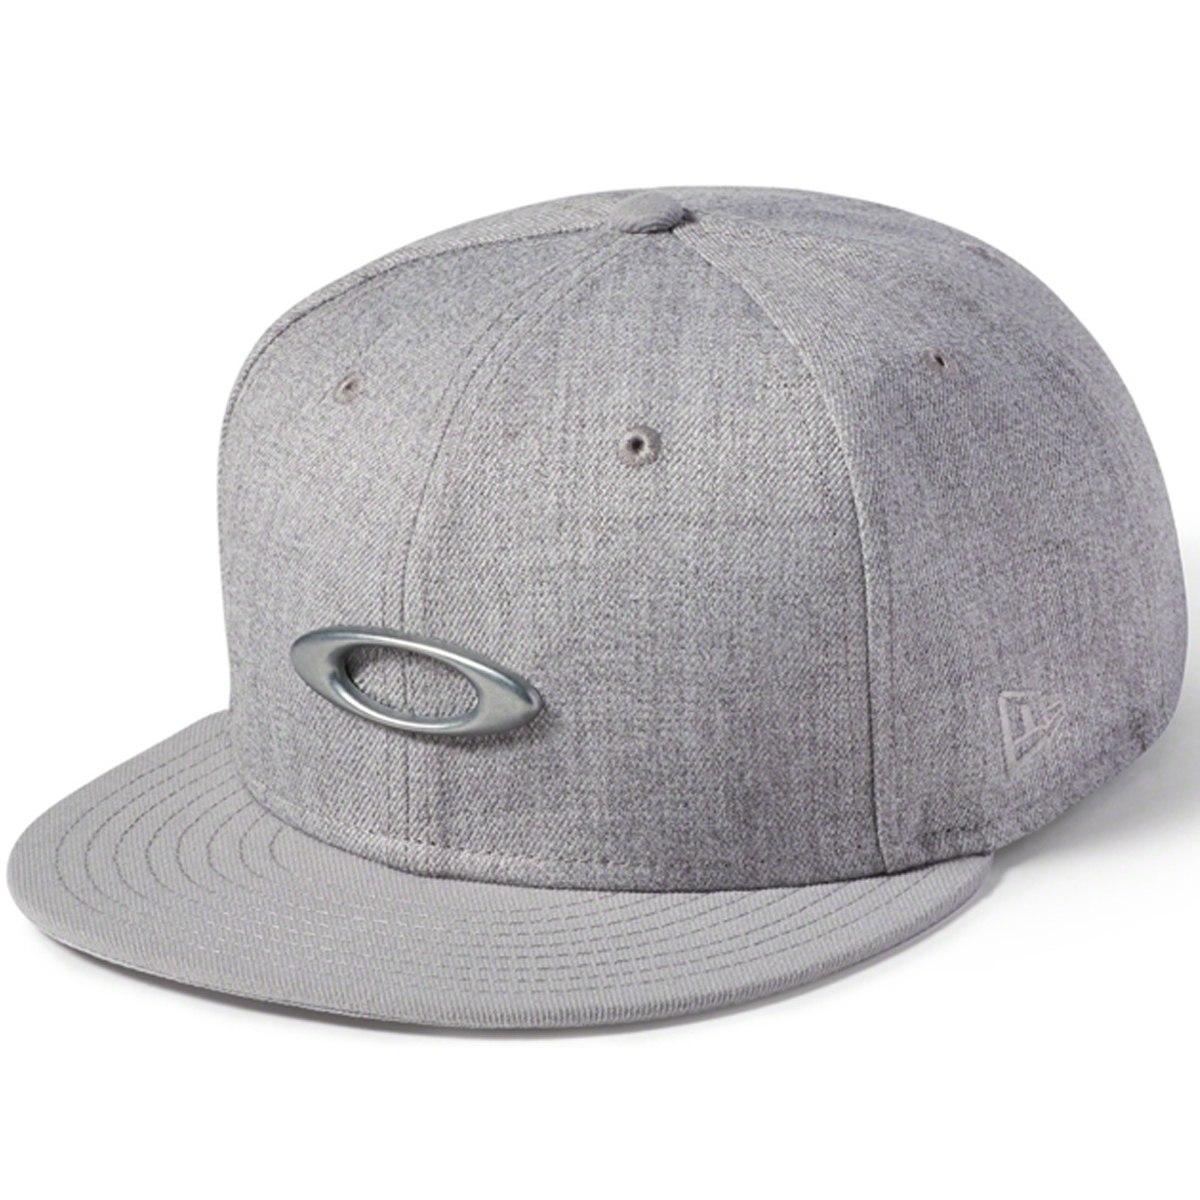 boné oakley o-justable metal cap cinza. Carregando zoom. 7a89b8f6f9c